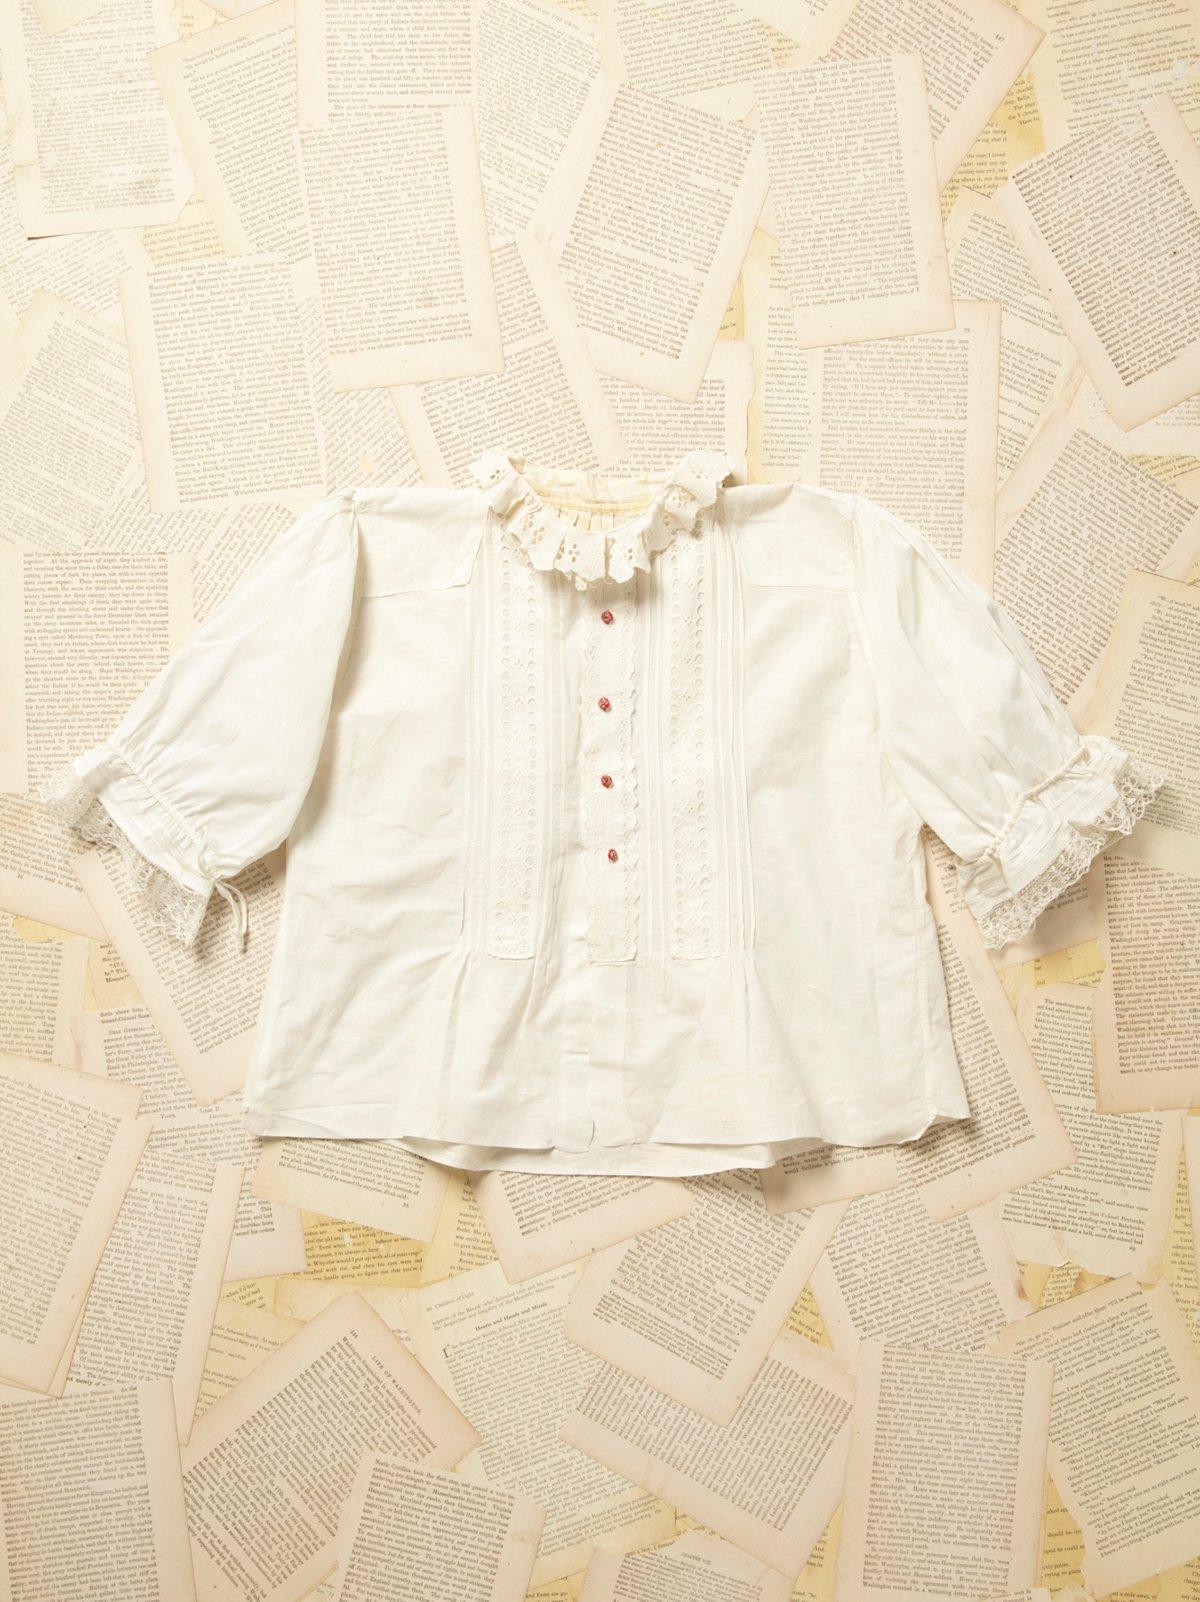 Vintage Victorian Cotton and Lace Blouse